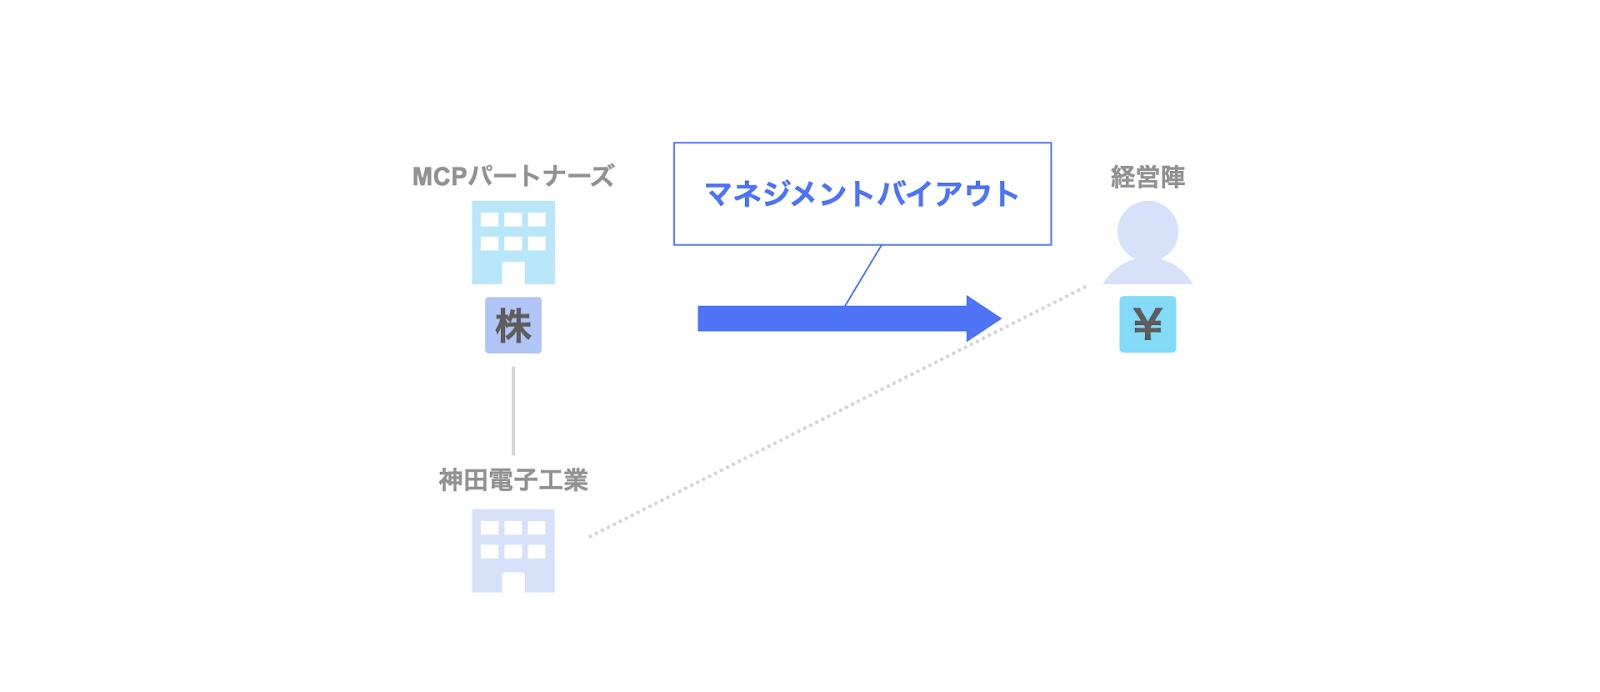 MCPパートナーズによる神田電子工業のExit(MBO)